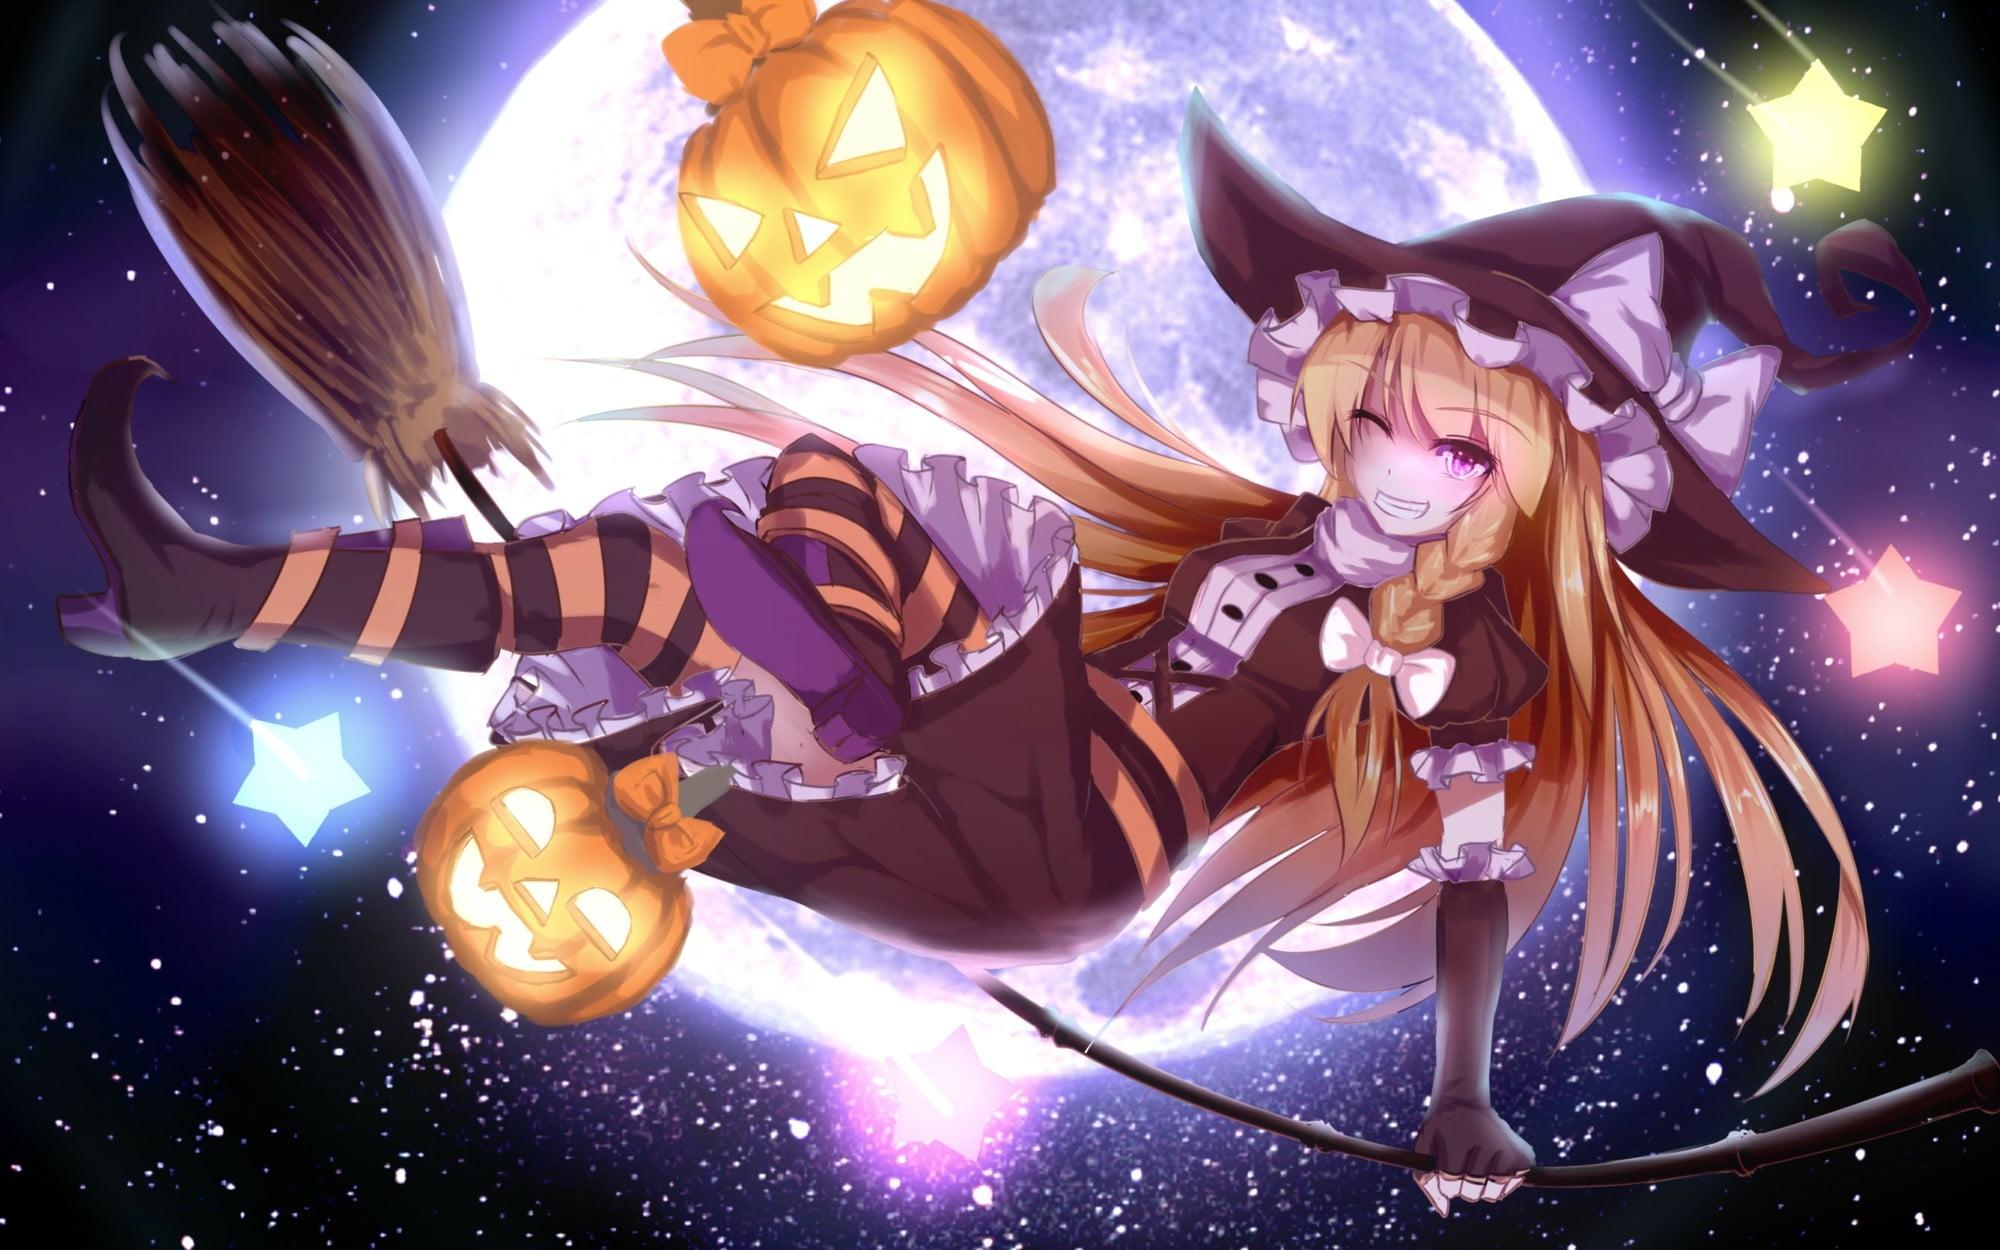 Anime Touhou Halloween Kirisame Marisa HD wallpaper Wallpaper 2000x1250